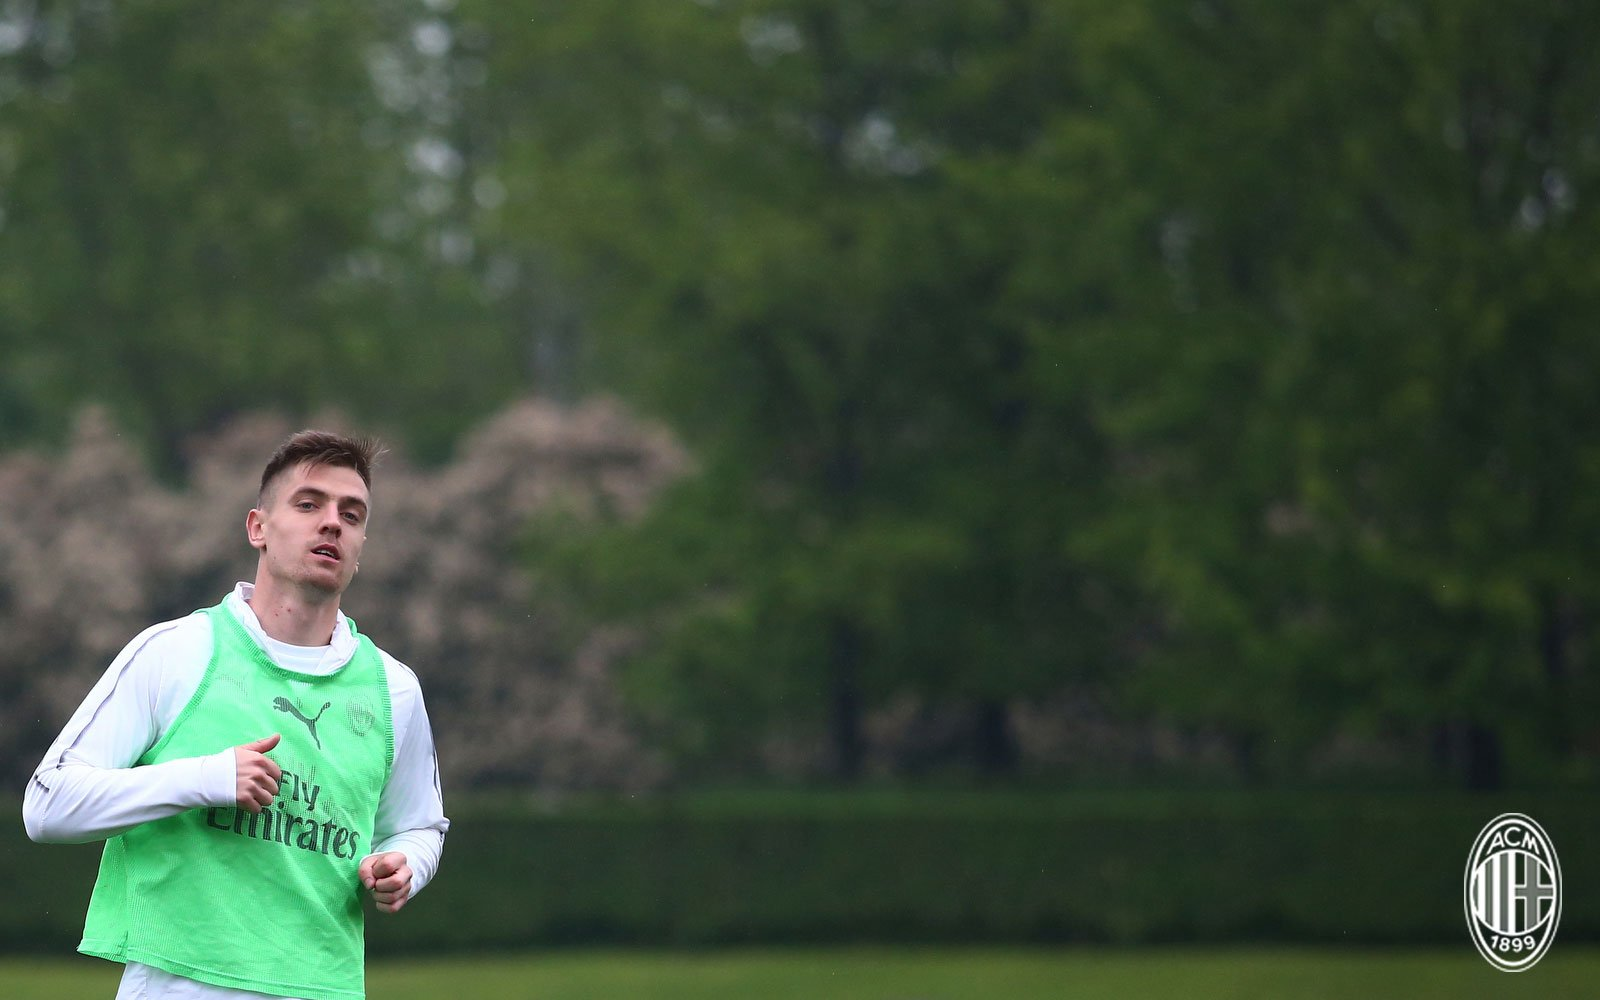 Krzysztof Piątek during training at Milanello. (@acmilan.com)